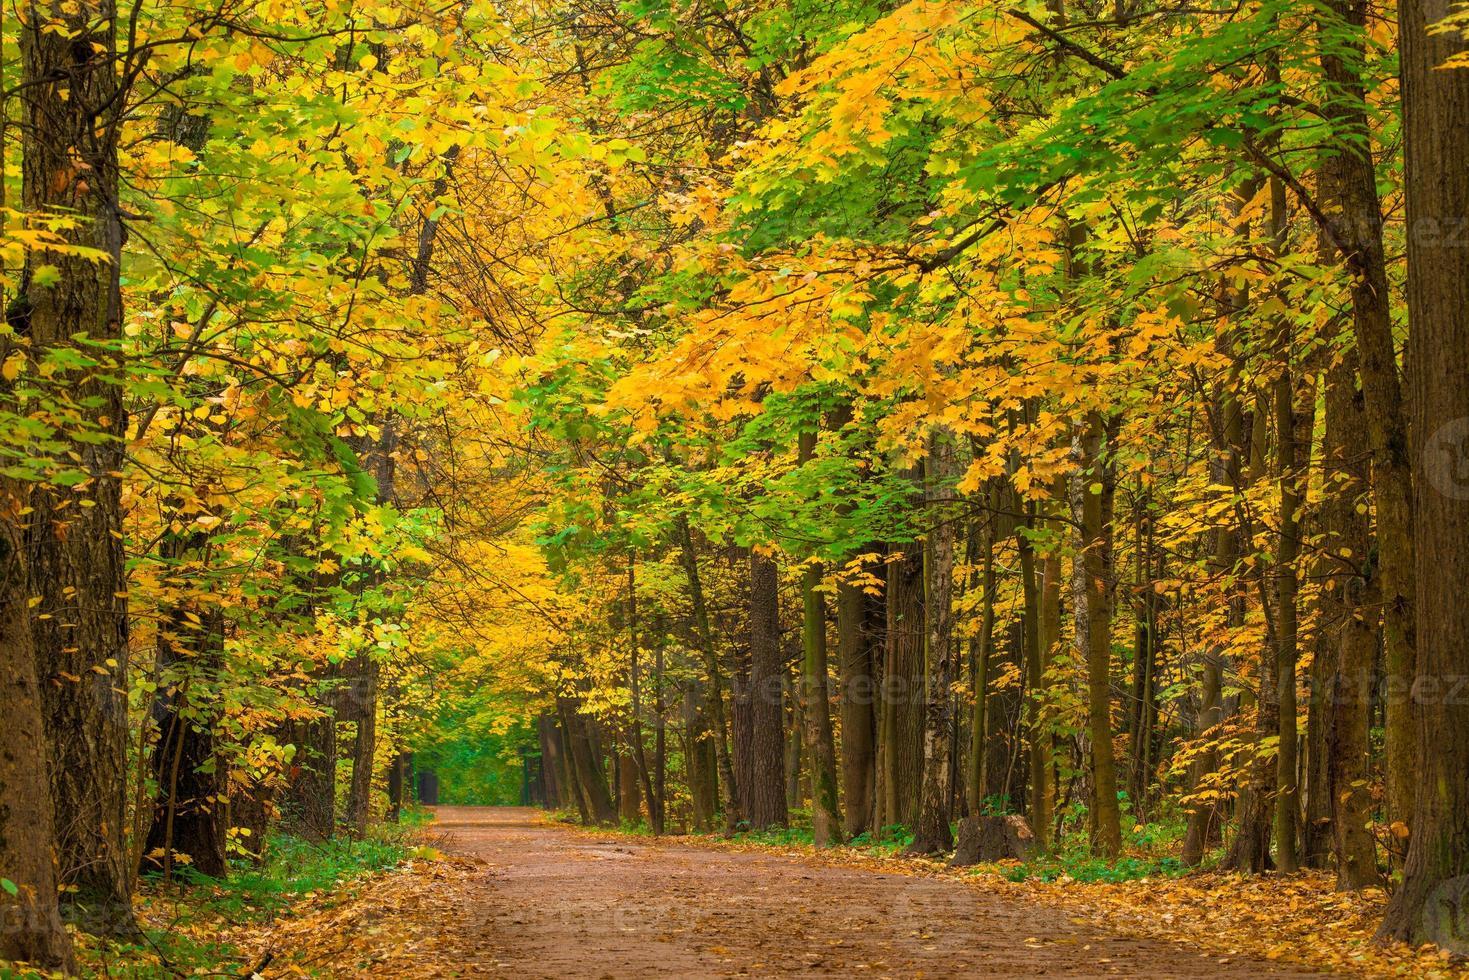 foglie d'acero ingiallite in autunno parco foto